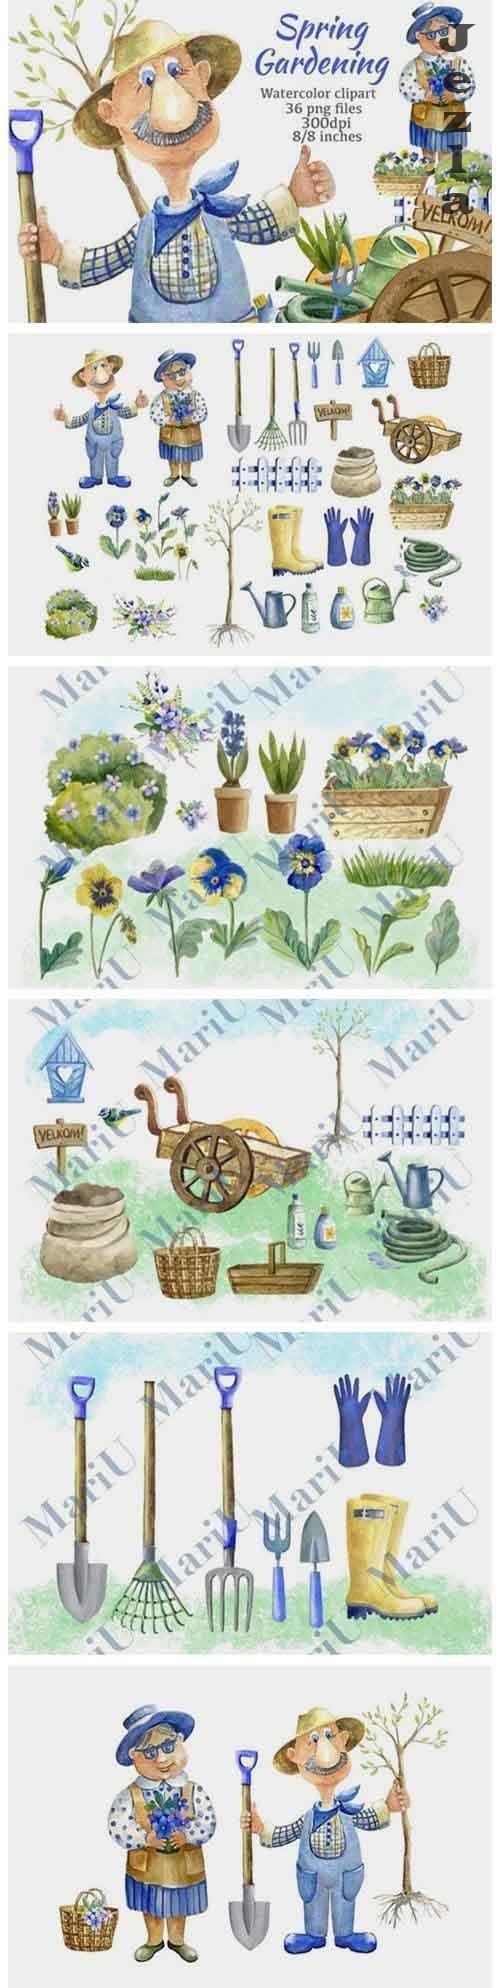 Garden clipart.Spring Gardening Clipart. Gardener - 1131069